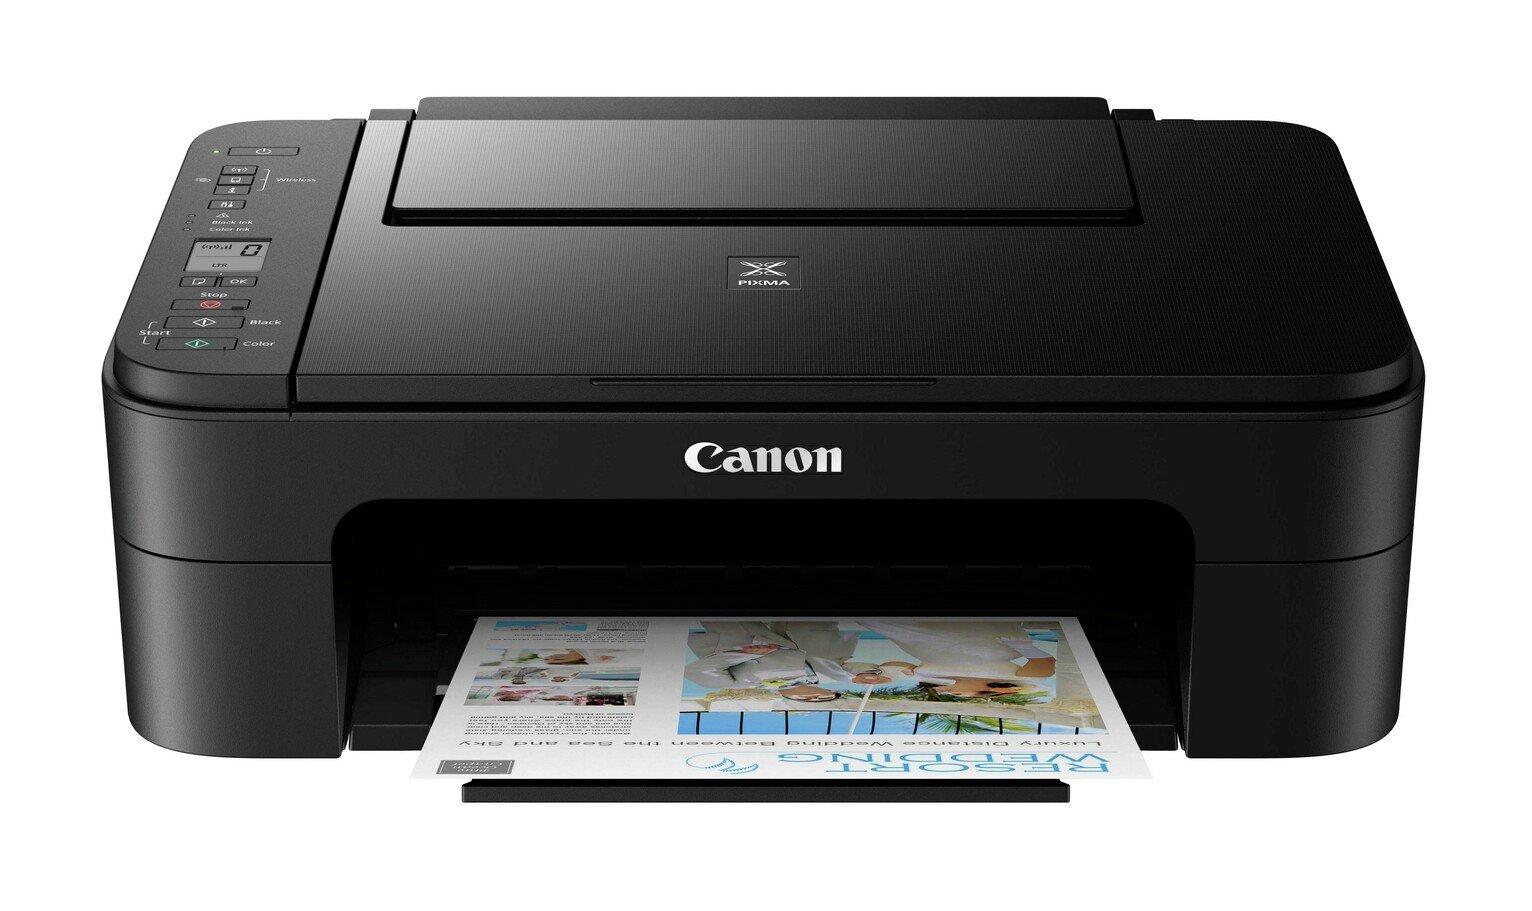 Canon PIXMA TS3350 Wireless Inkjet Printer